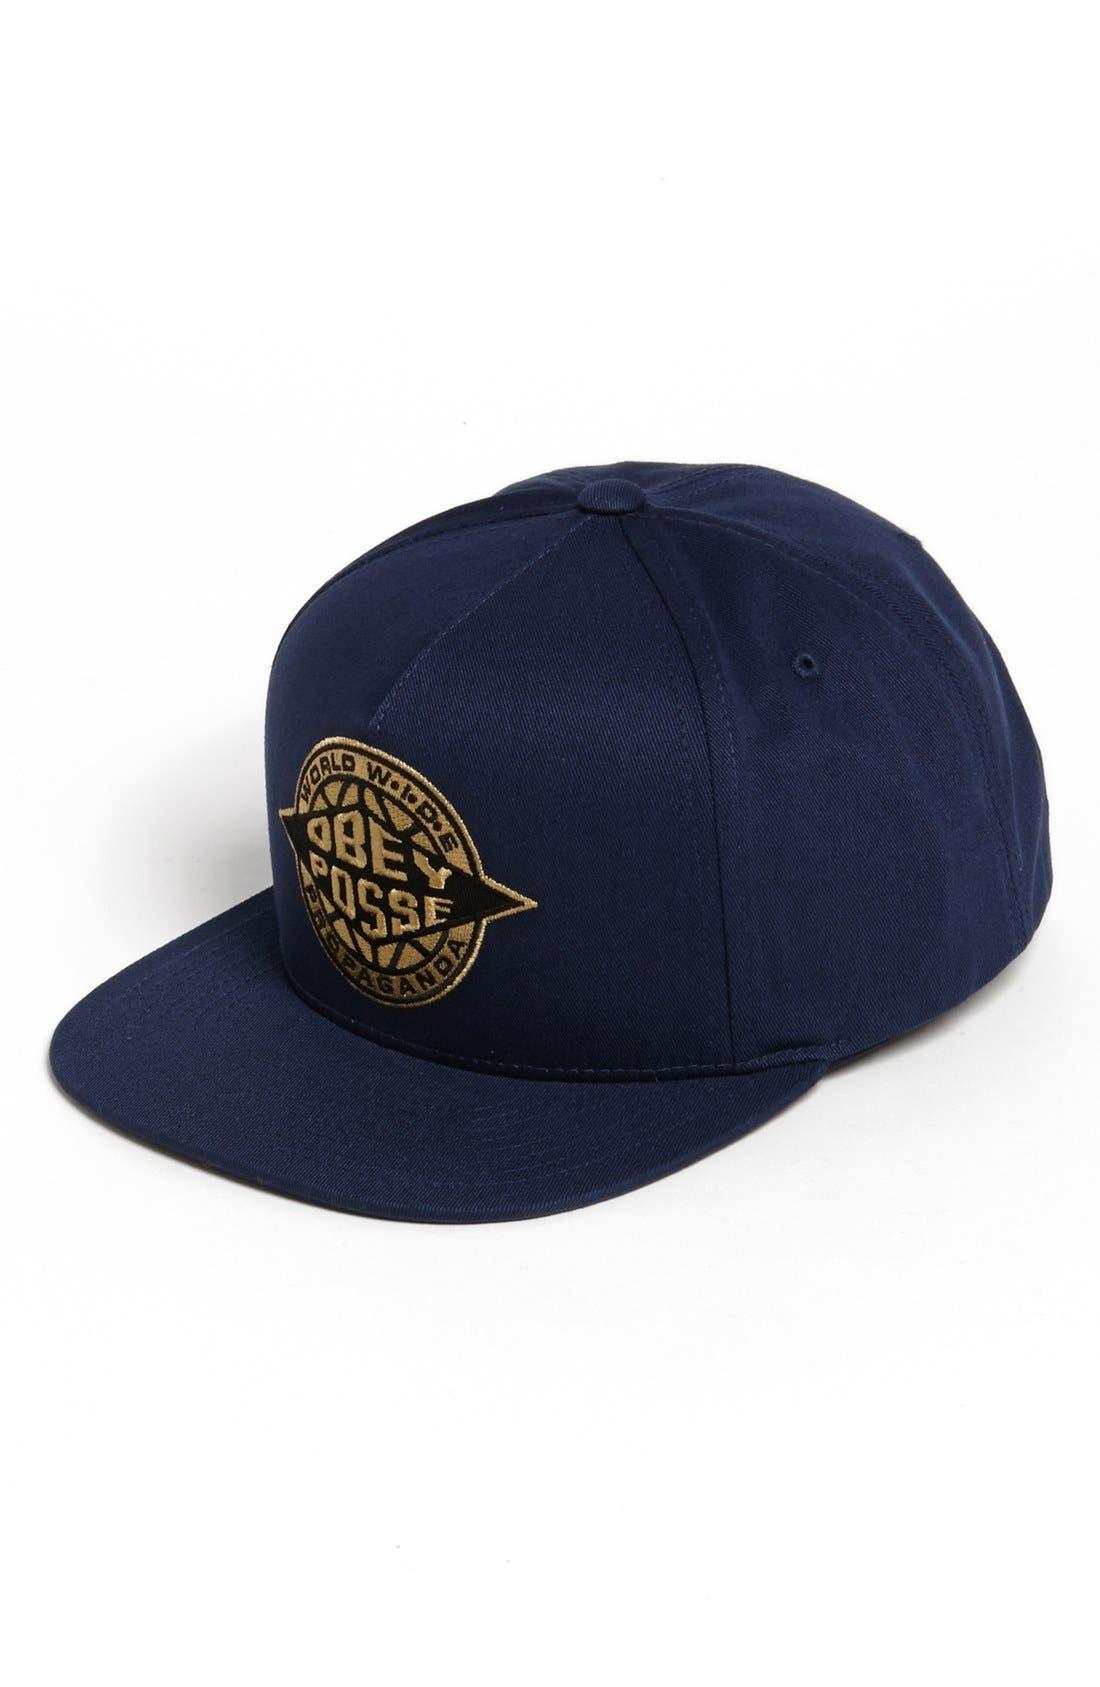 Alternate Image 1 Selected - Obey 'Ill' Snapback Baseball Cap